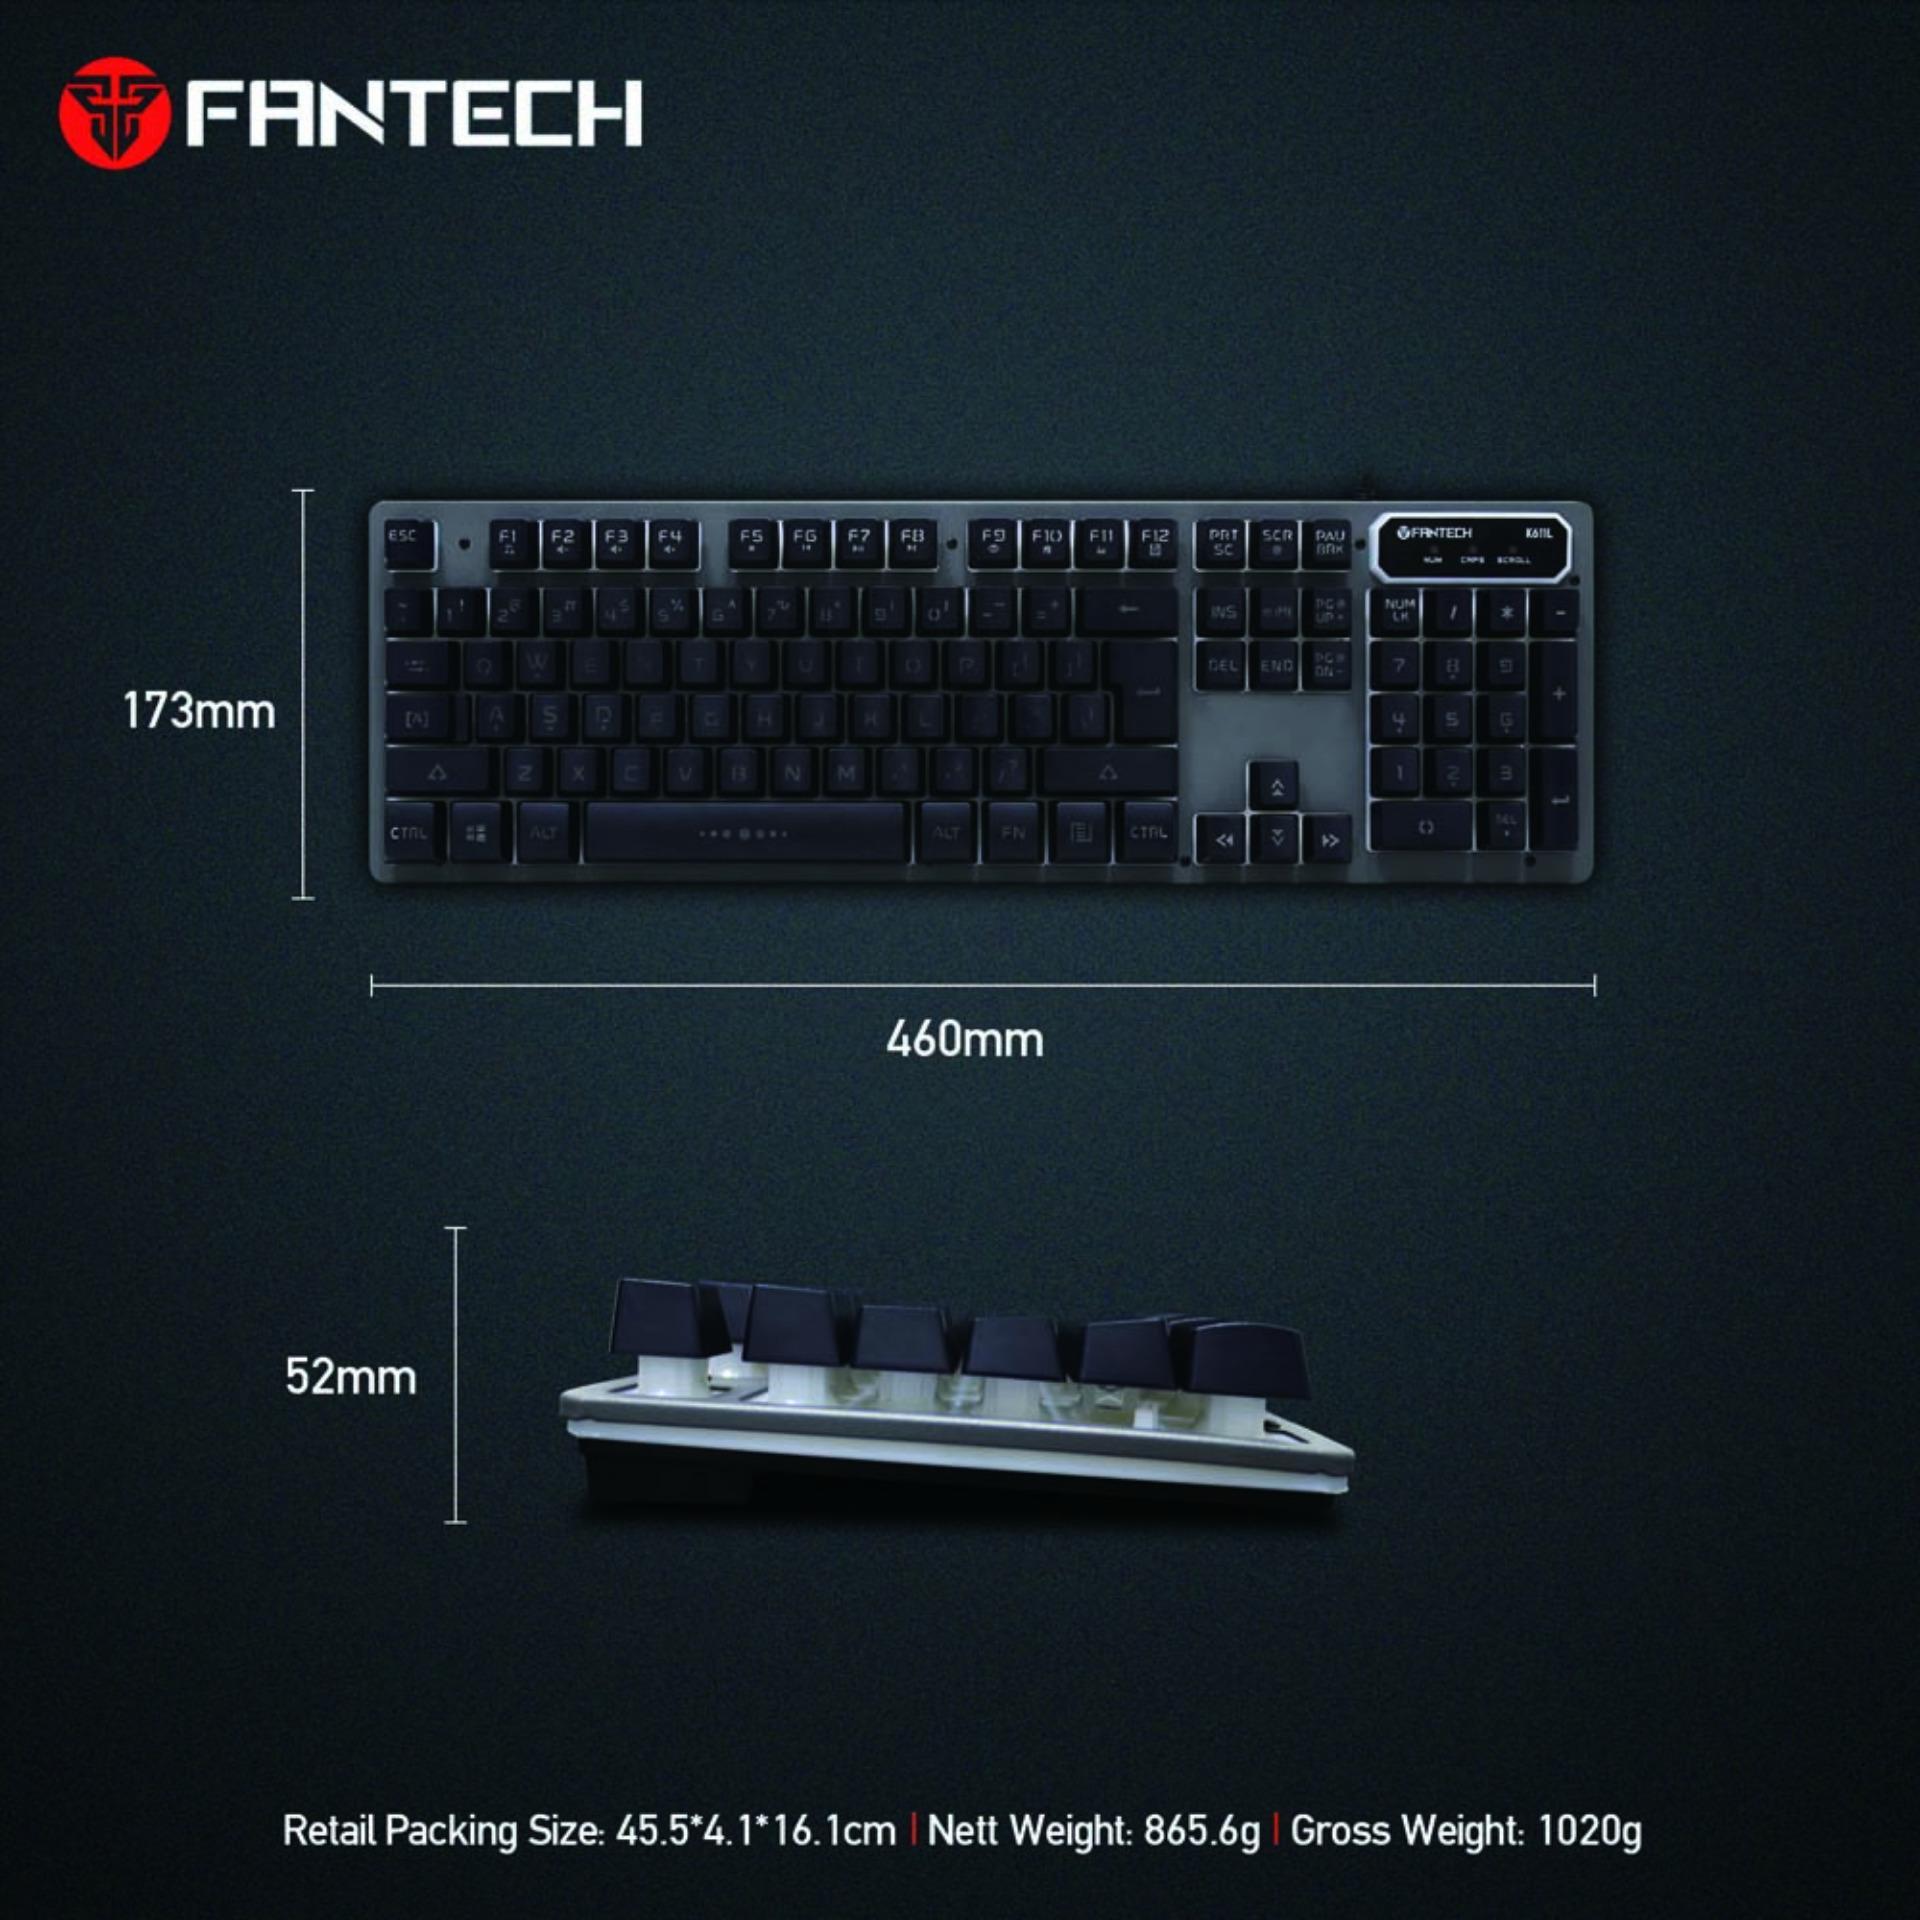 Fantech Keyboard Dan Mouse Wireless Wk 890 Hitam Daftar Harga Gaming  Logitech M170 Source K611l